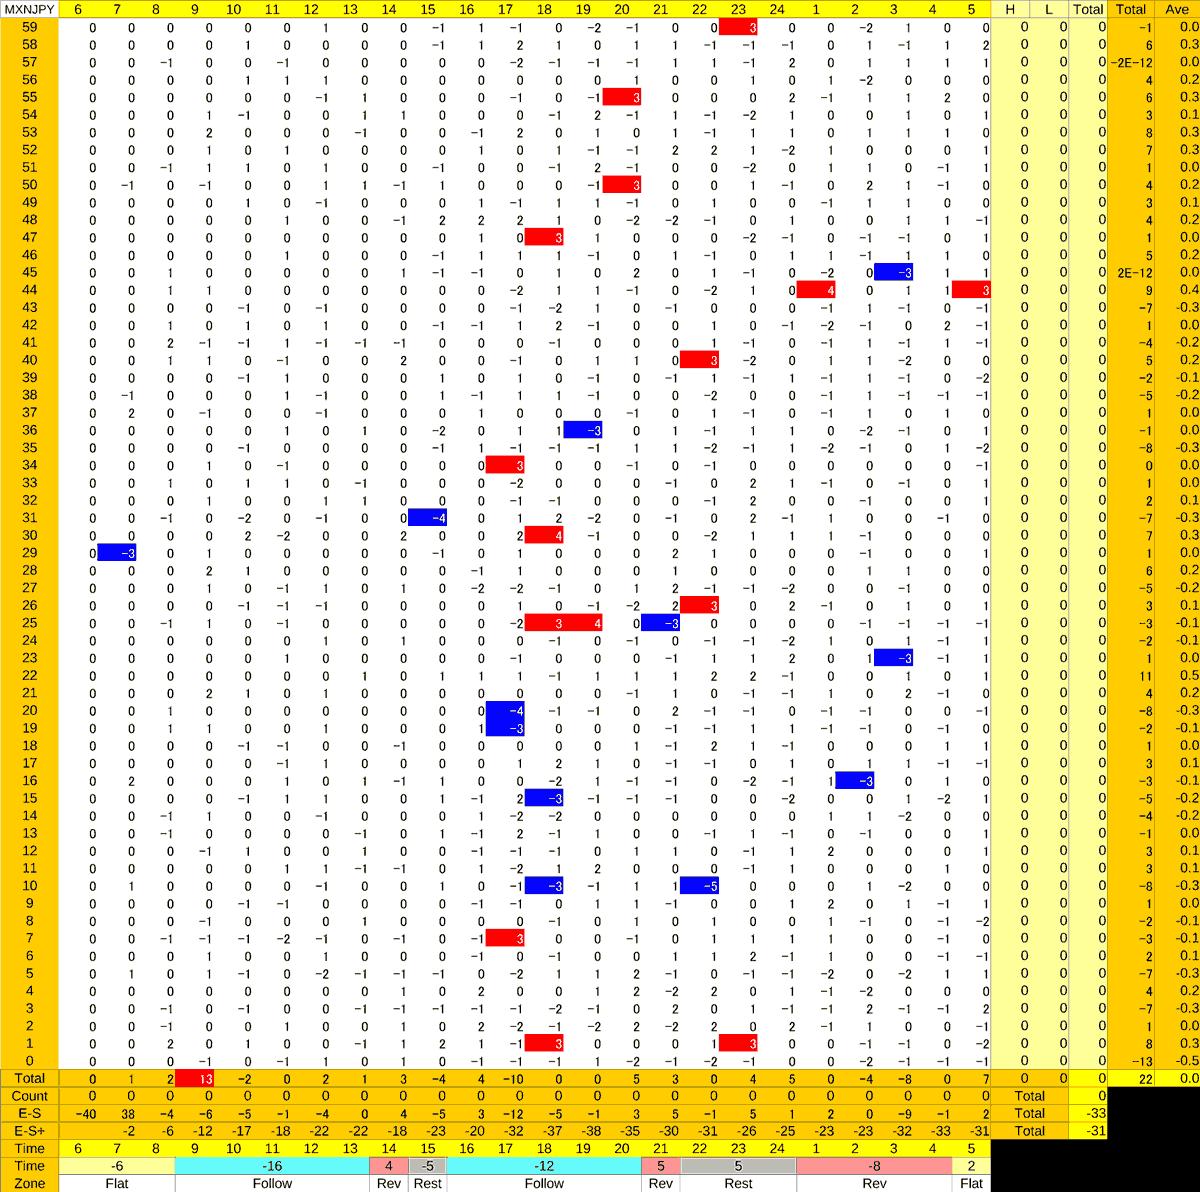 20201207_HS(3)MXNJPY